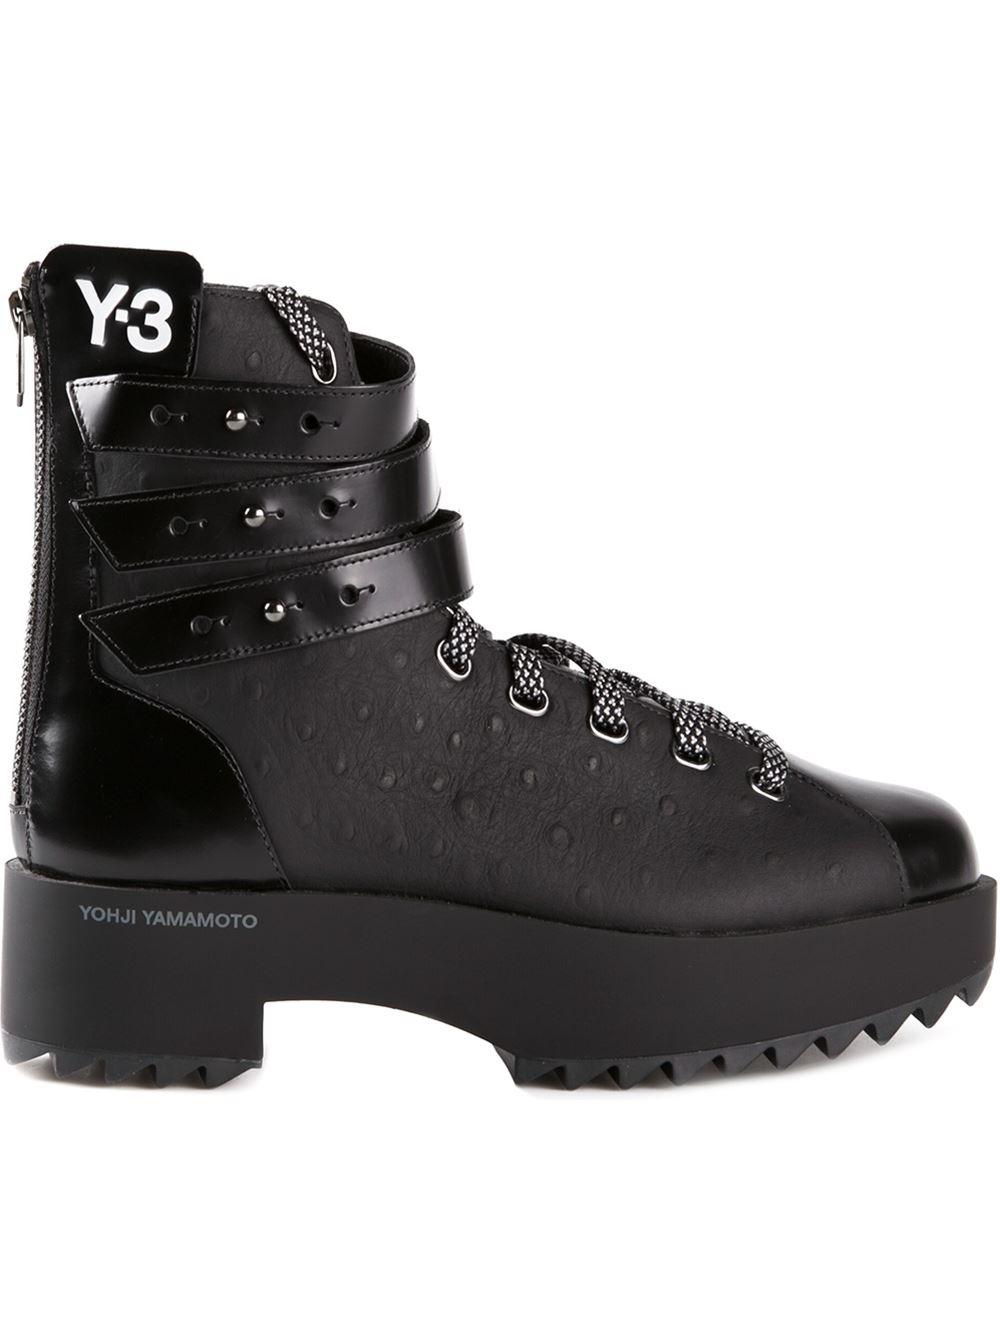 Y-3 'Hike Star Ii' Trainers in Black